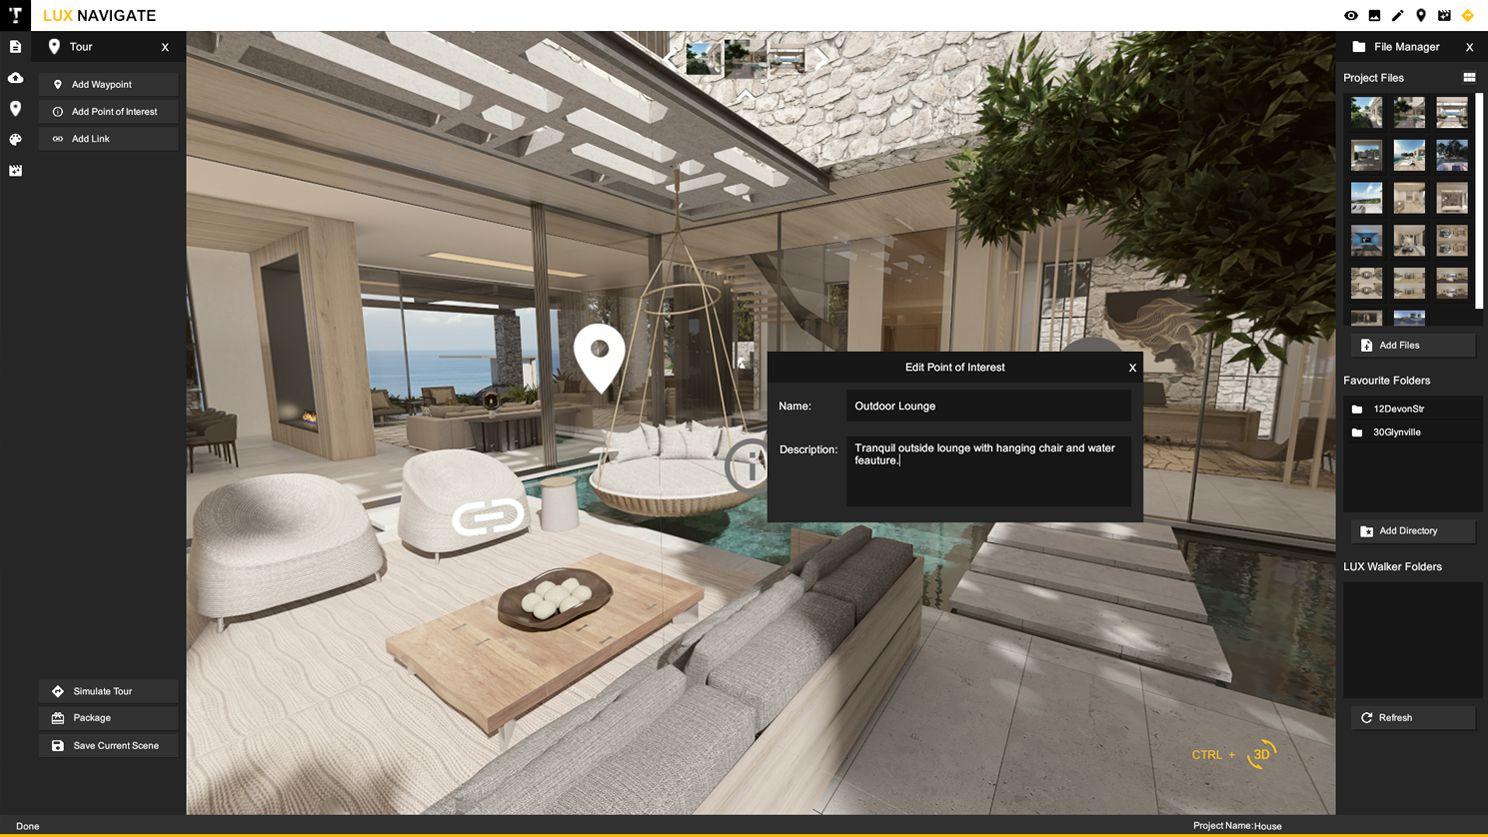 LUX Navigate 360 Content